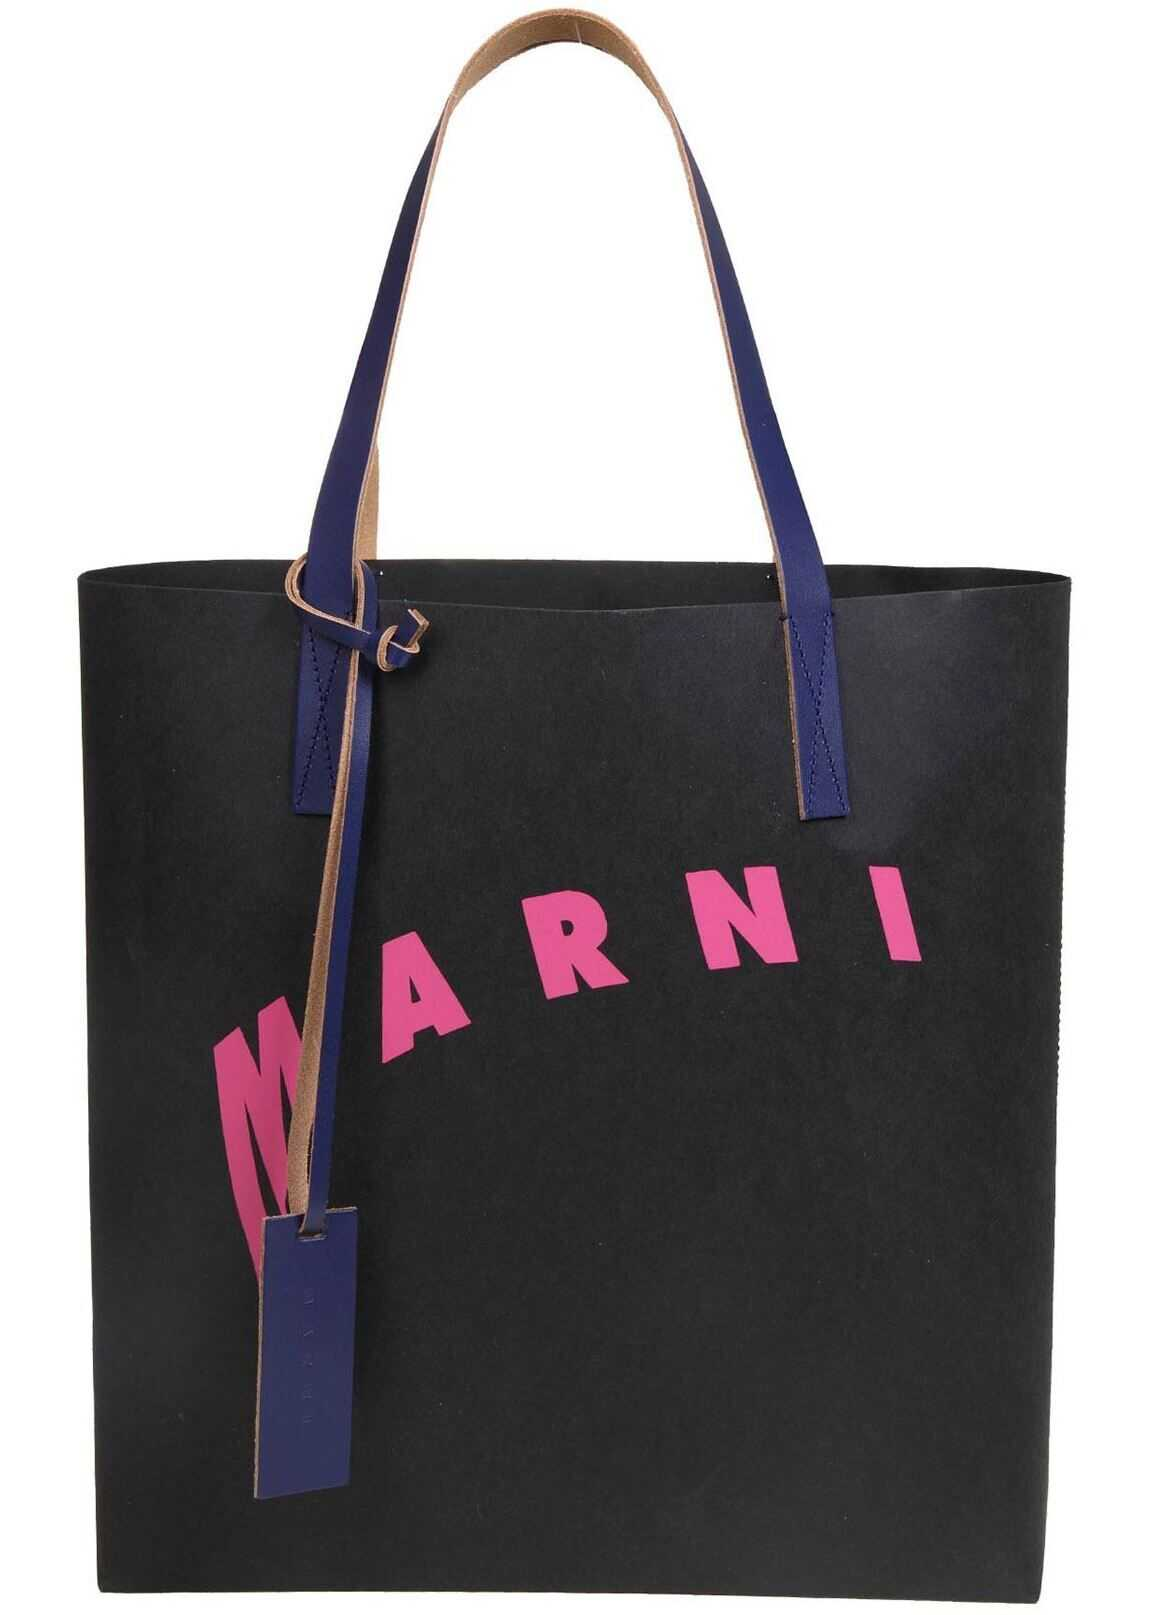 Marni Logo Shopping Bag In Black SHMPQ10A07P3951Z2N30 Black imagine b-mall.ro